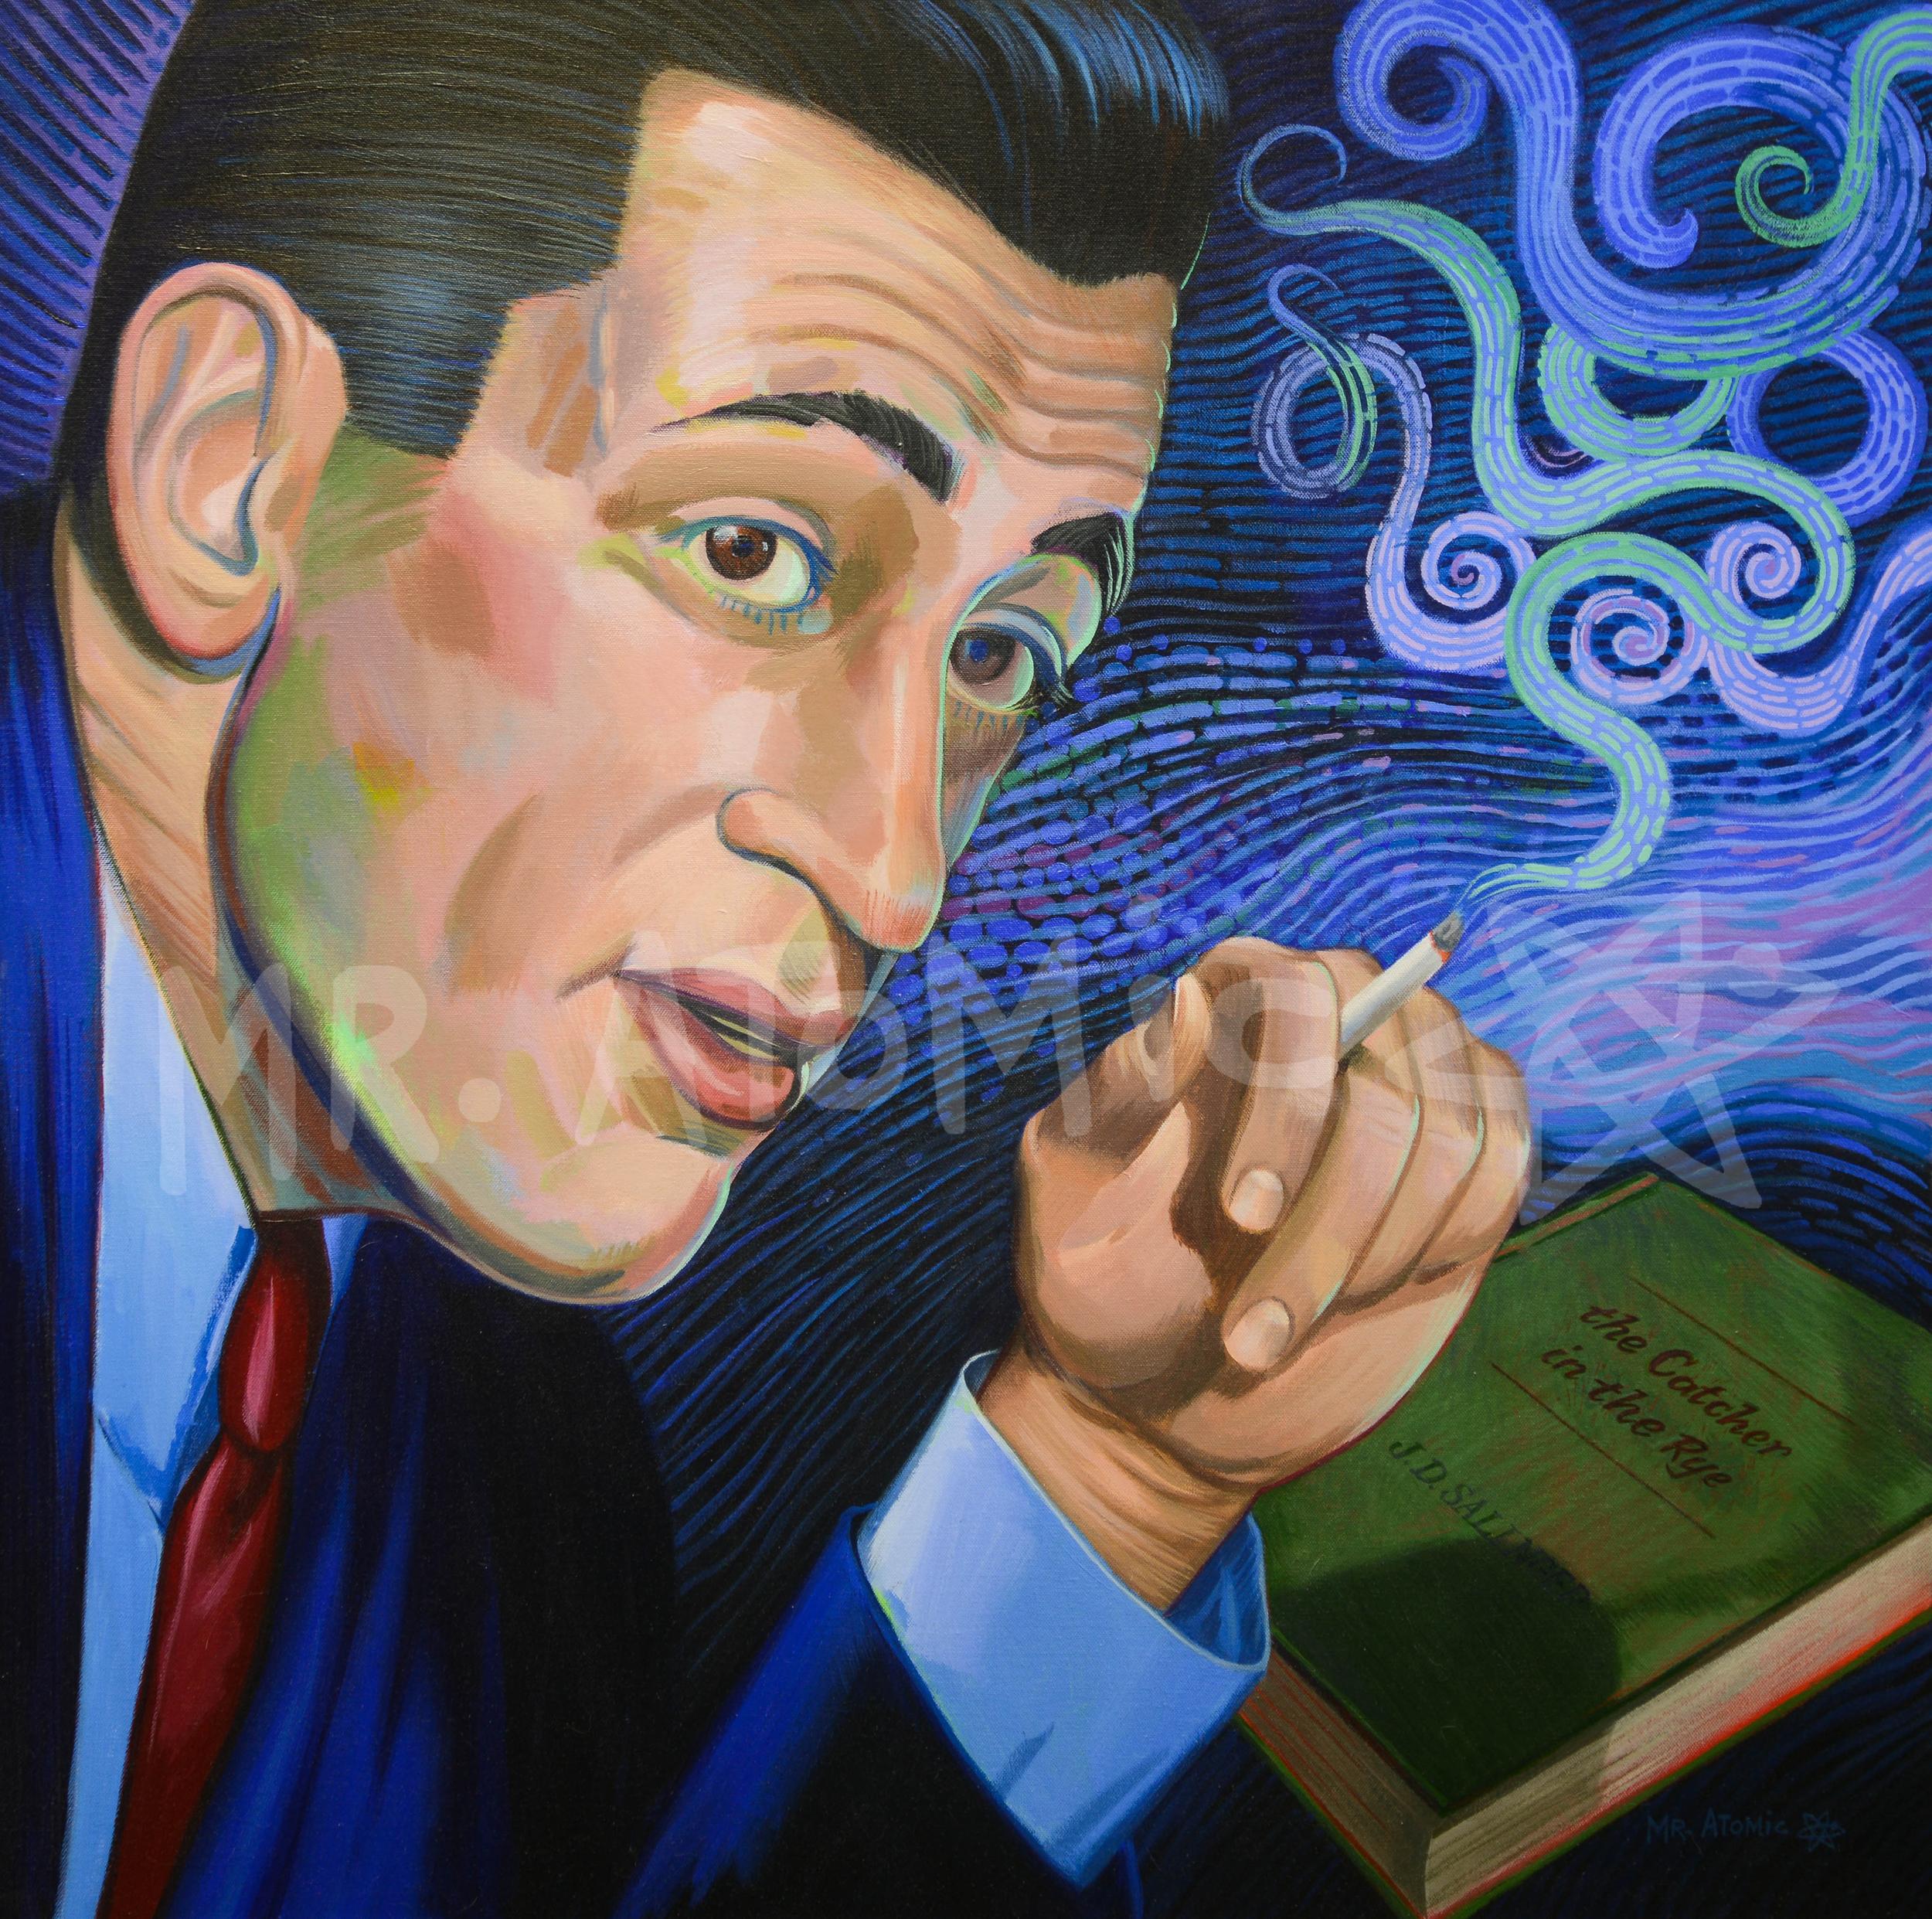 J.D. Salinger - 3' x 3'